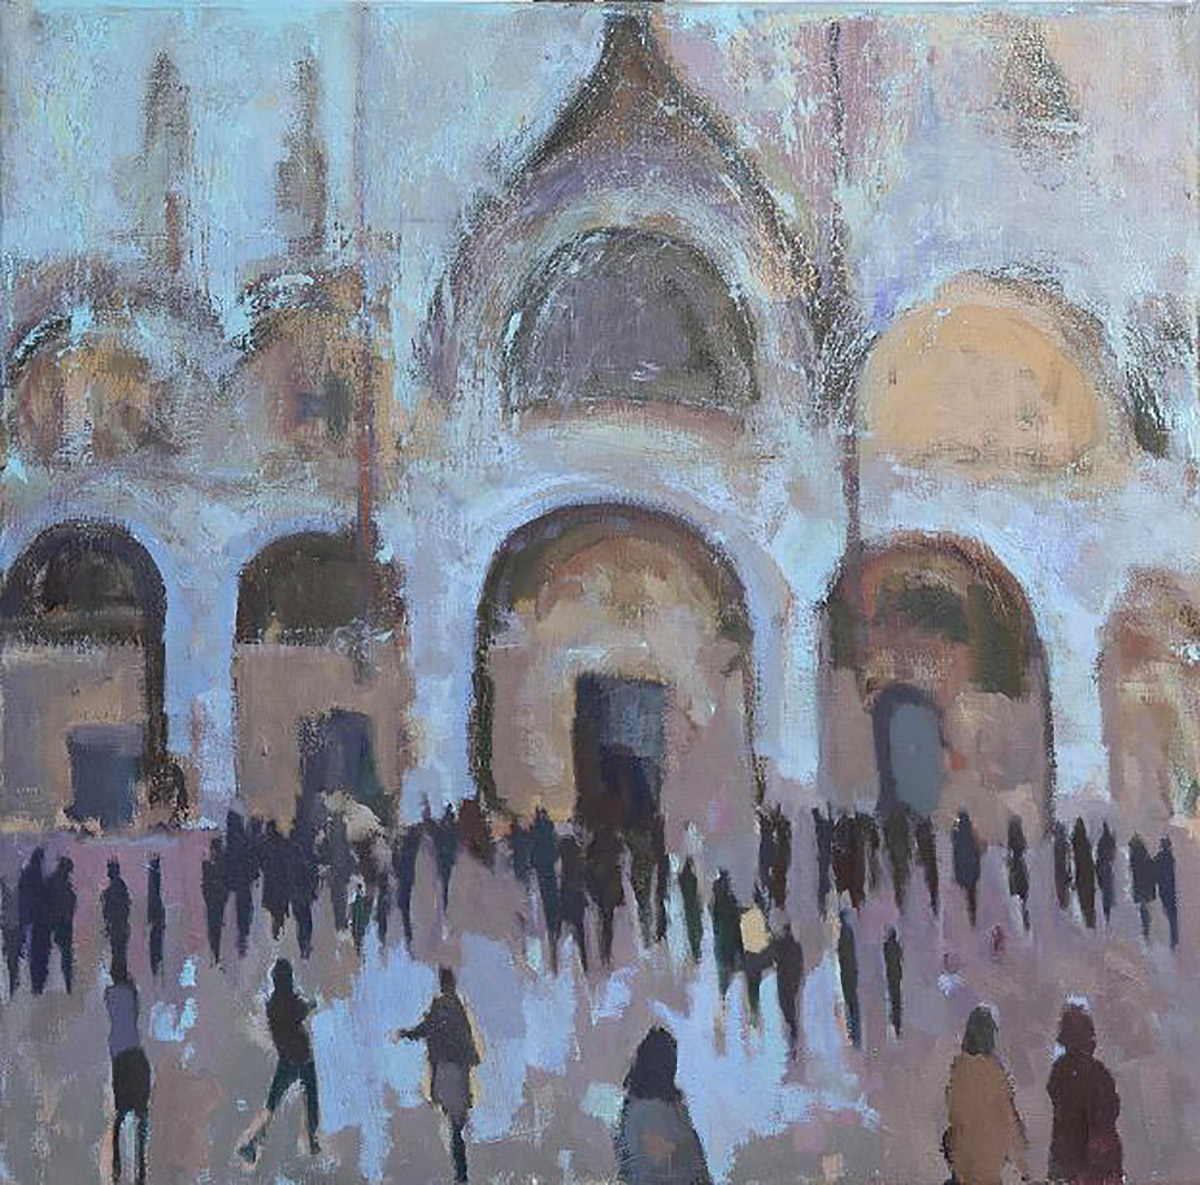 Michael Clark, 'San Marco', oil on linen